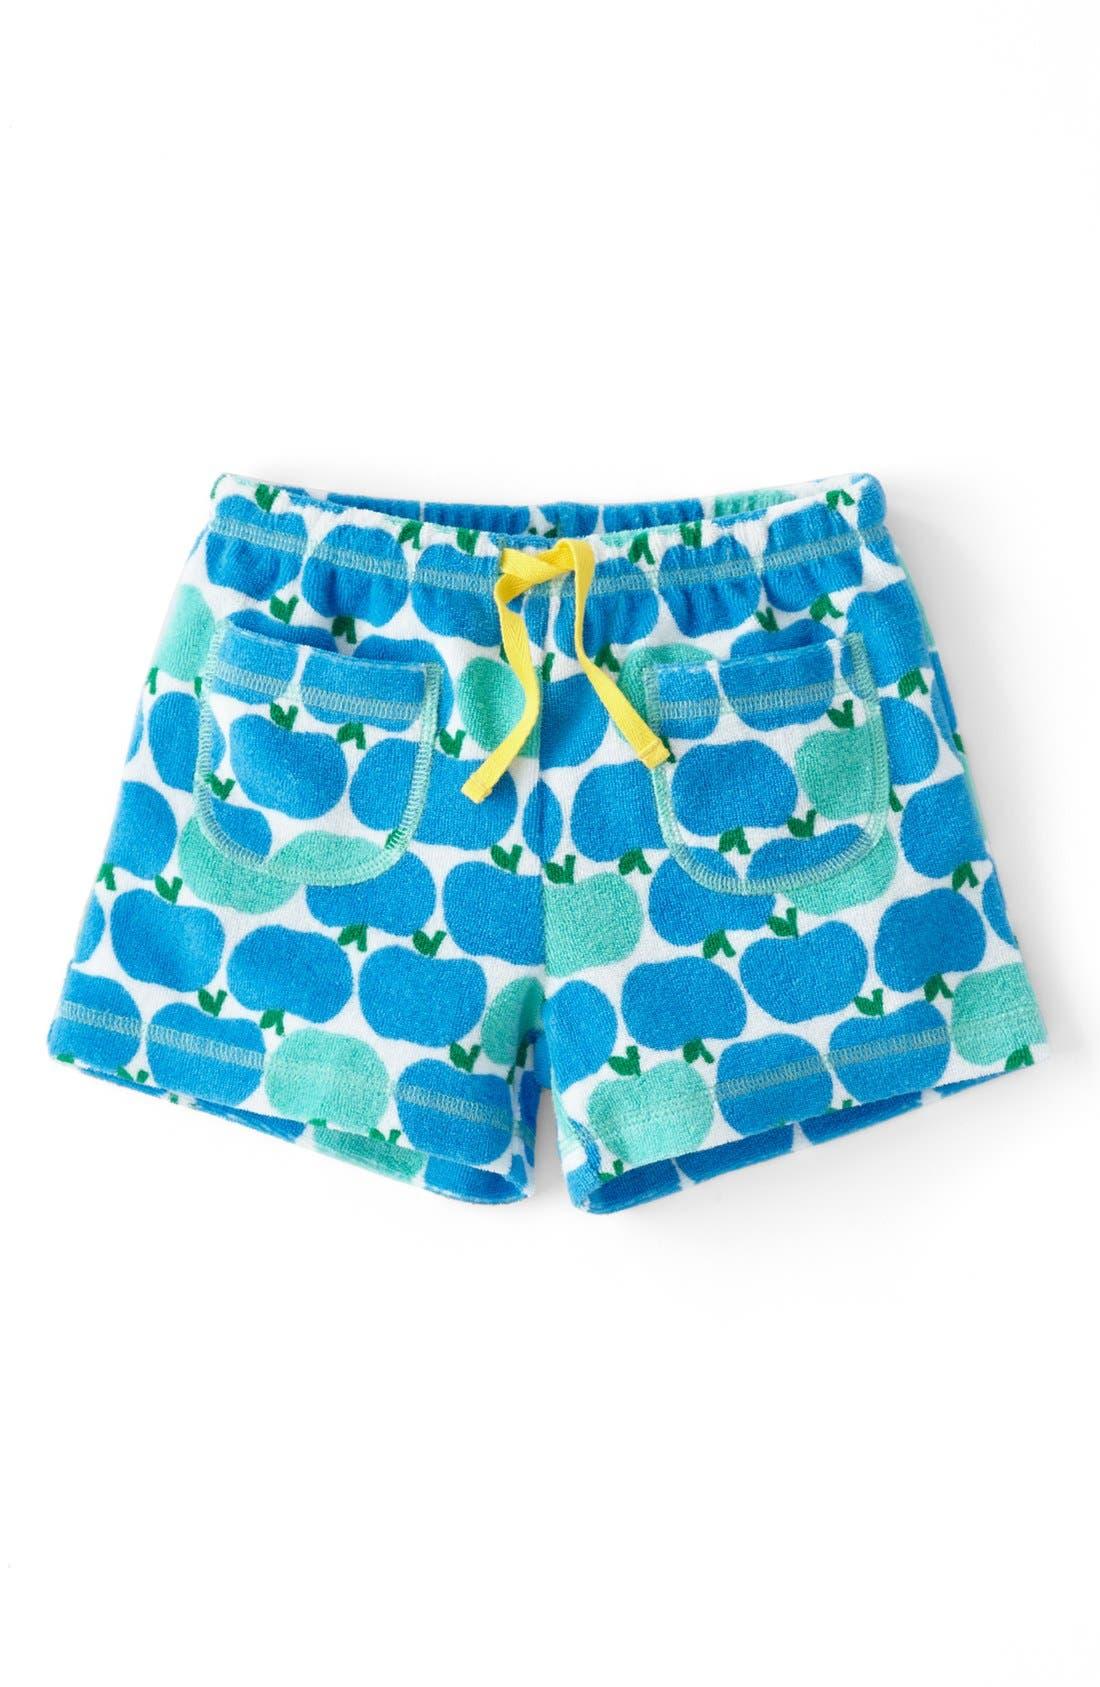 Alternate Image 1 Selected - Mini Boden 'Towelling' Shorts (Toddler Girls, Little Girls & Big Girls)(Online Only)